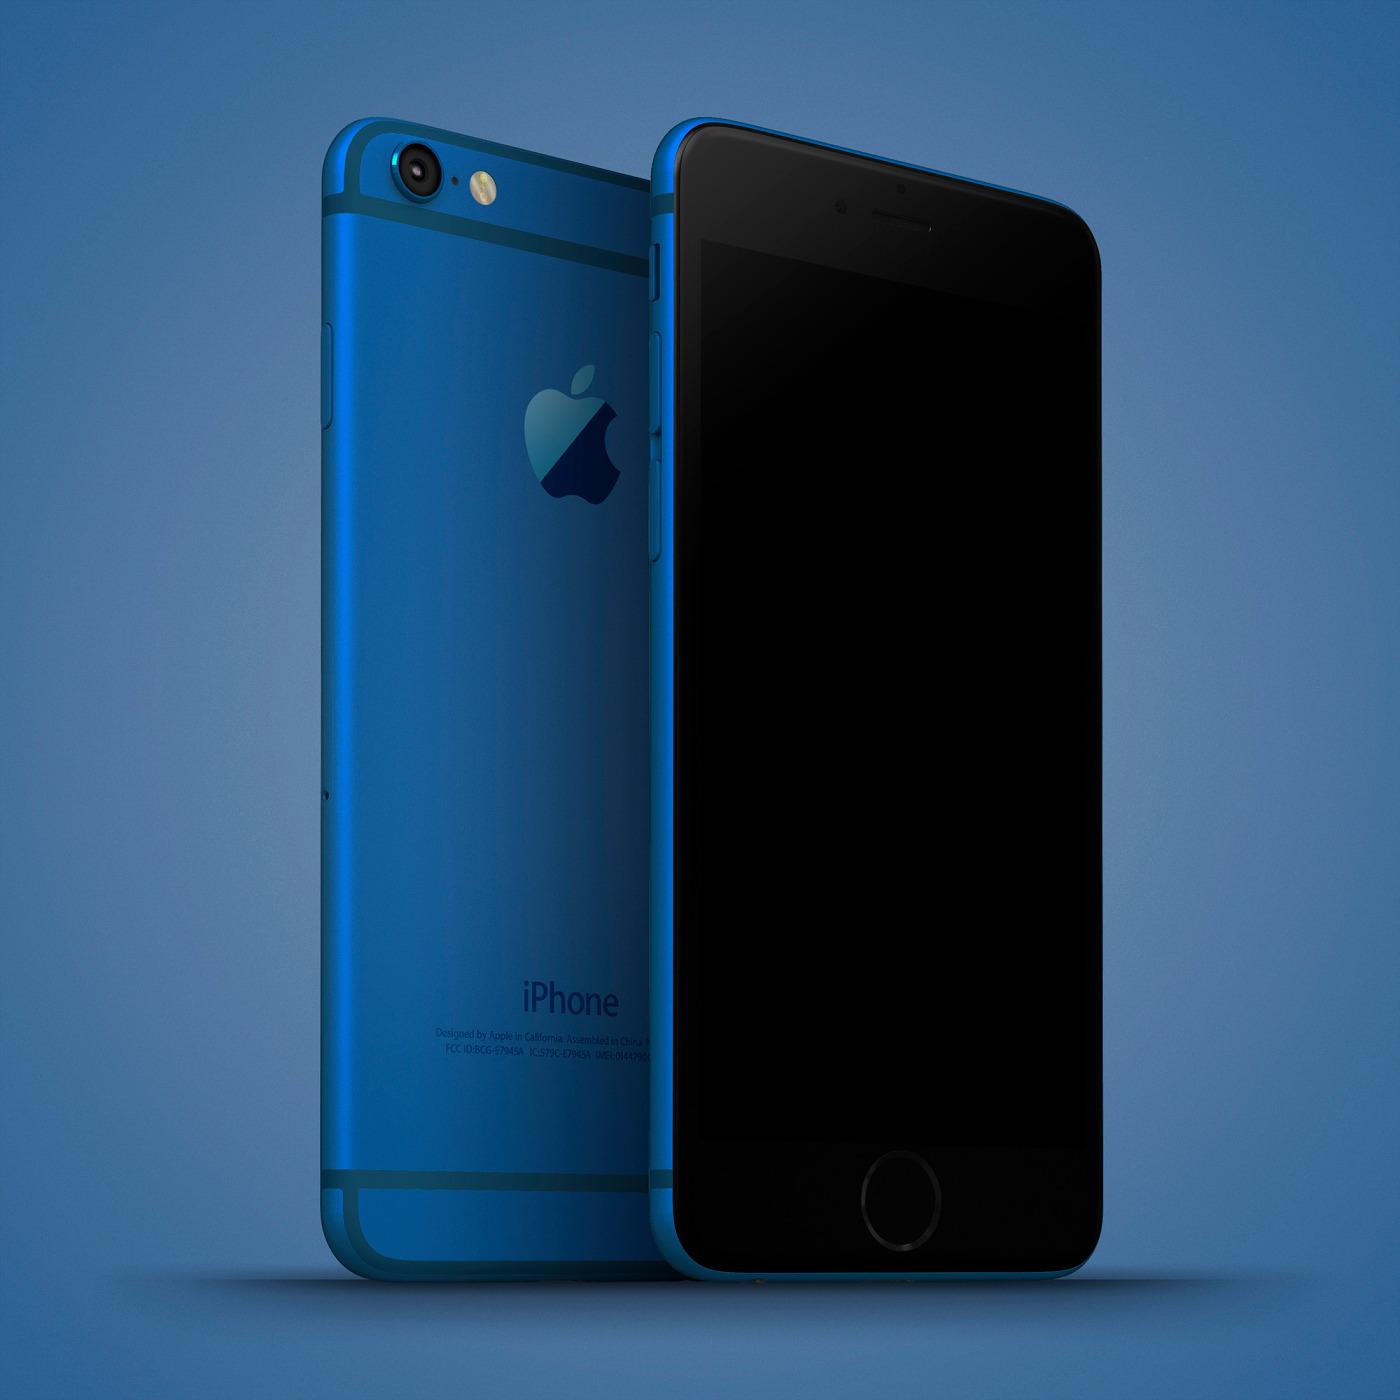 iphone-6c-blue_both1